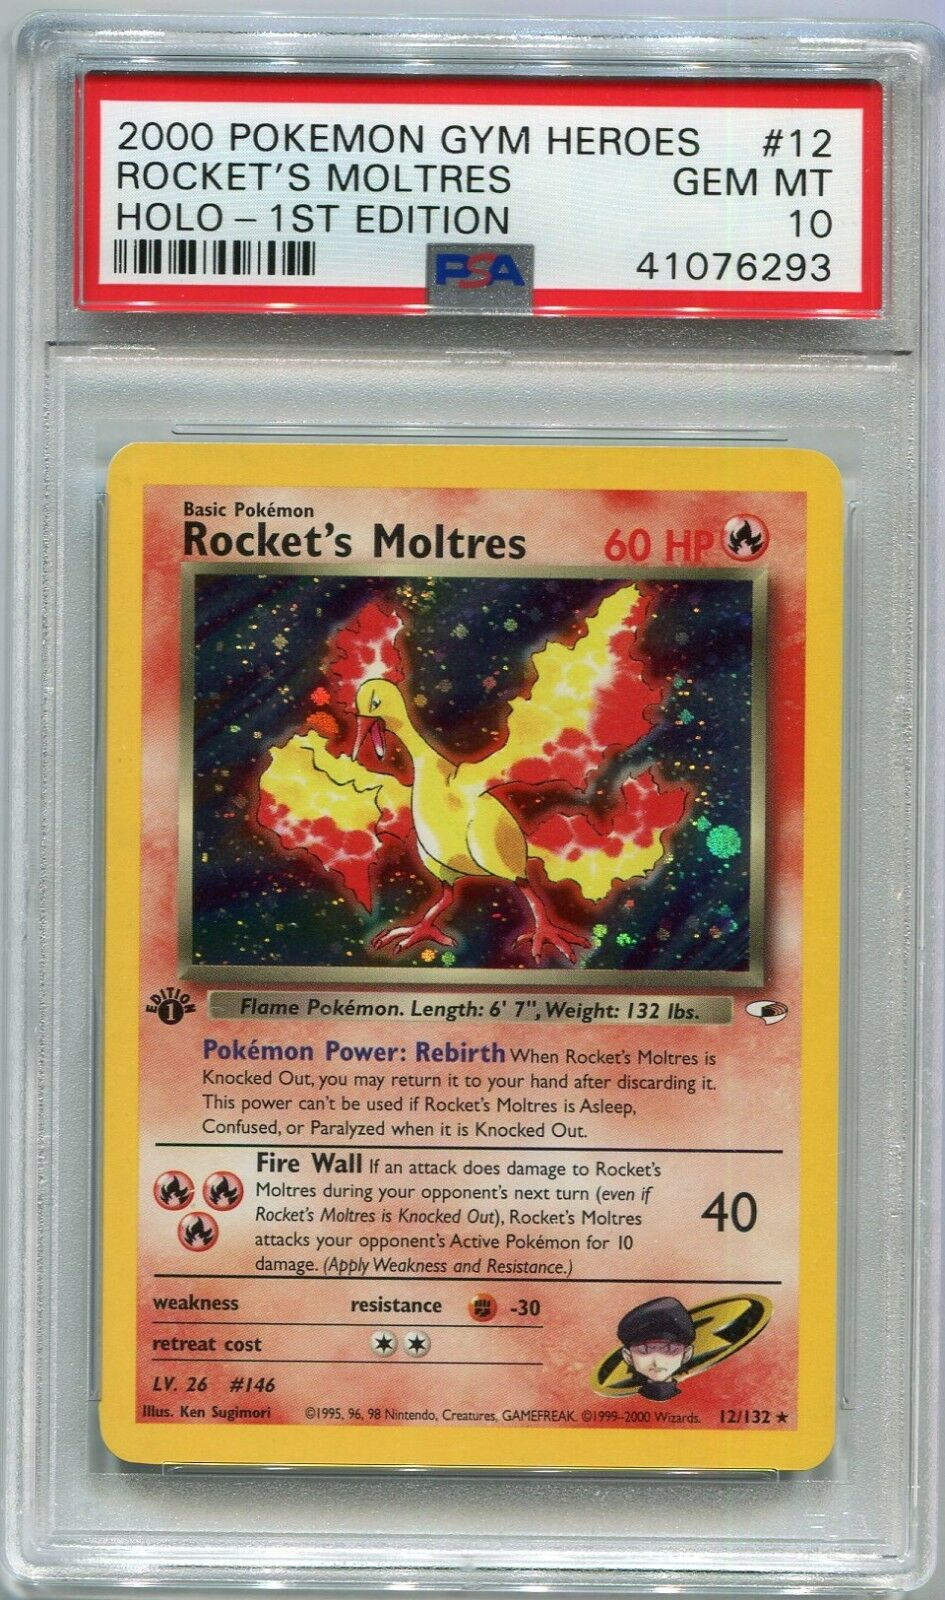 Pokemon Card 1st Edition Rockets Moltres Gym Heroes 12132 PSA 10 Gem Mint